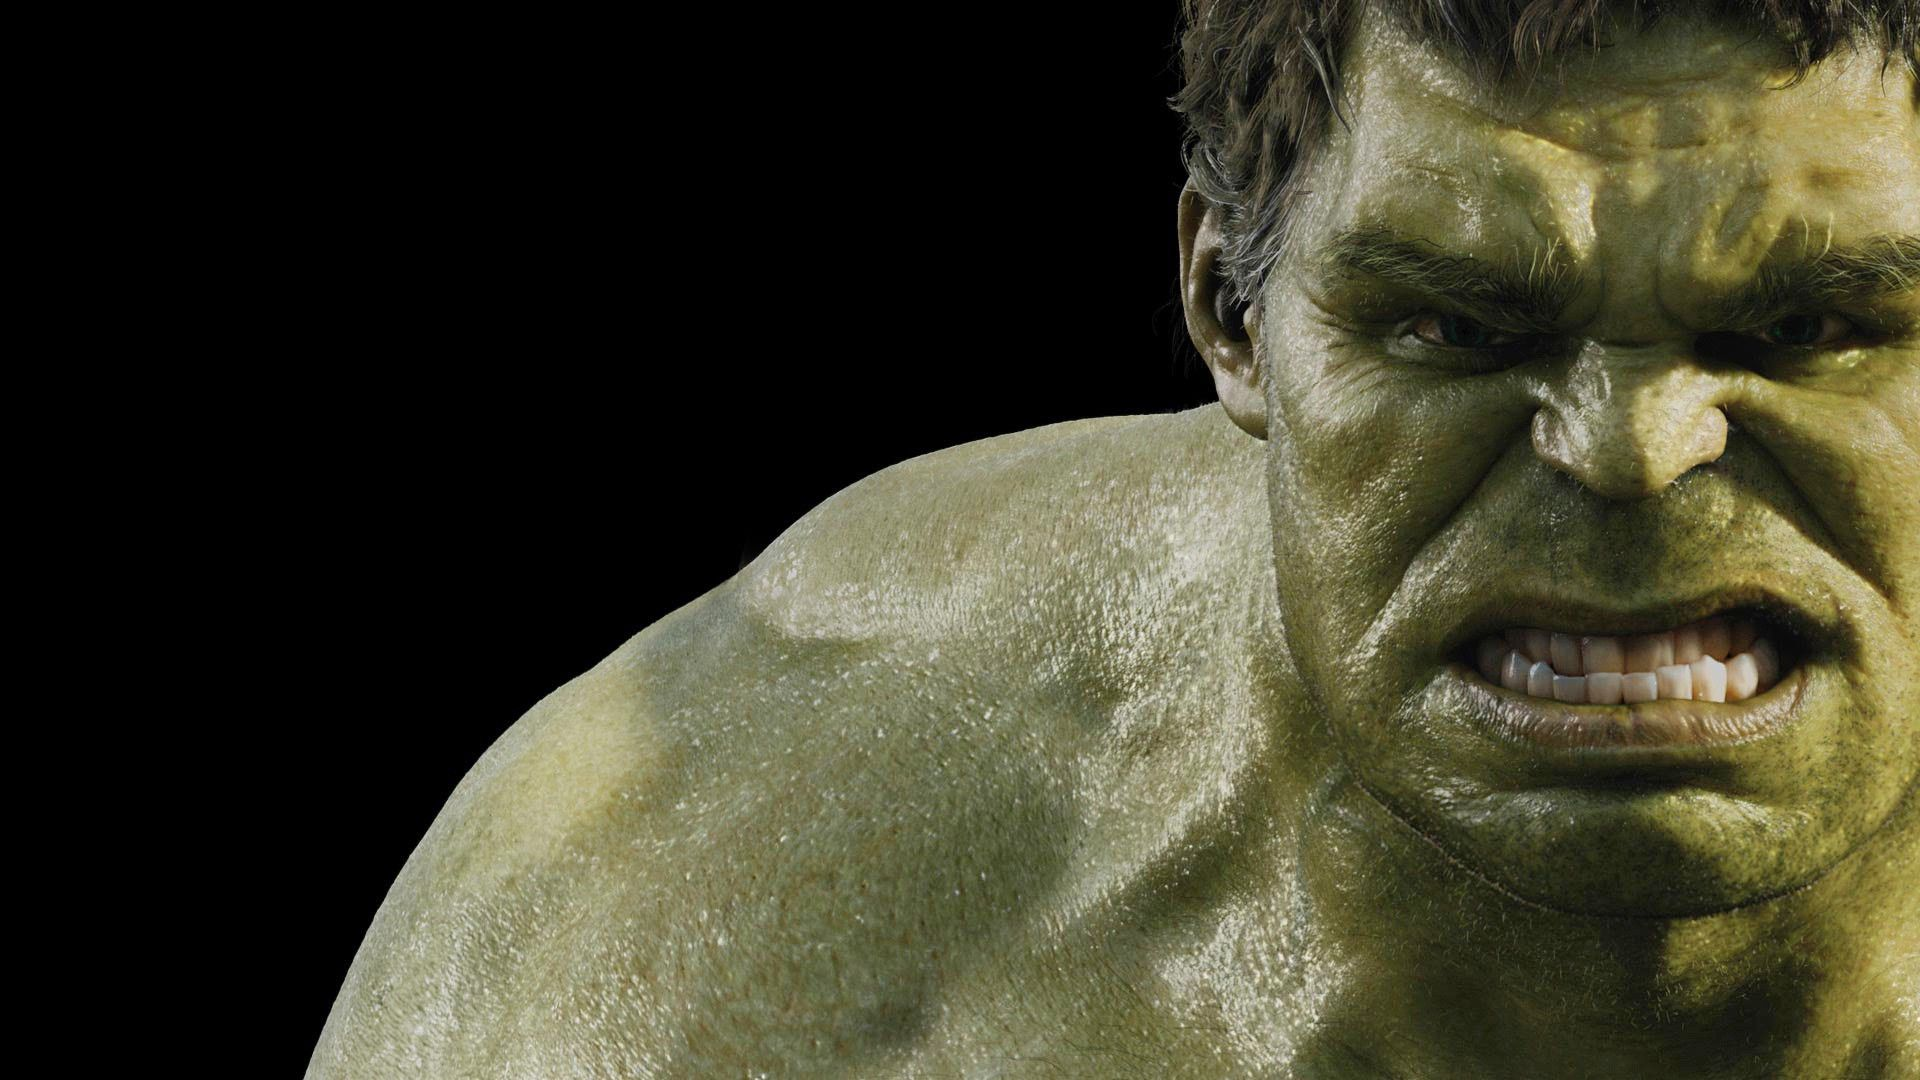 HD Hulk Desktop Wallpapers   Top HD Hulk Desktop Backgrounds 1920x1080